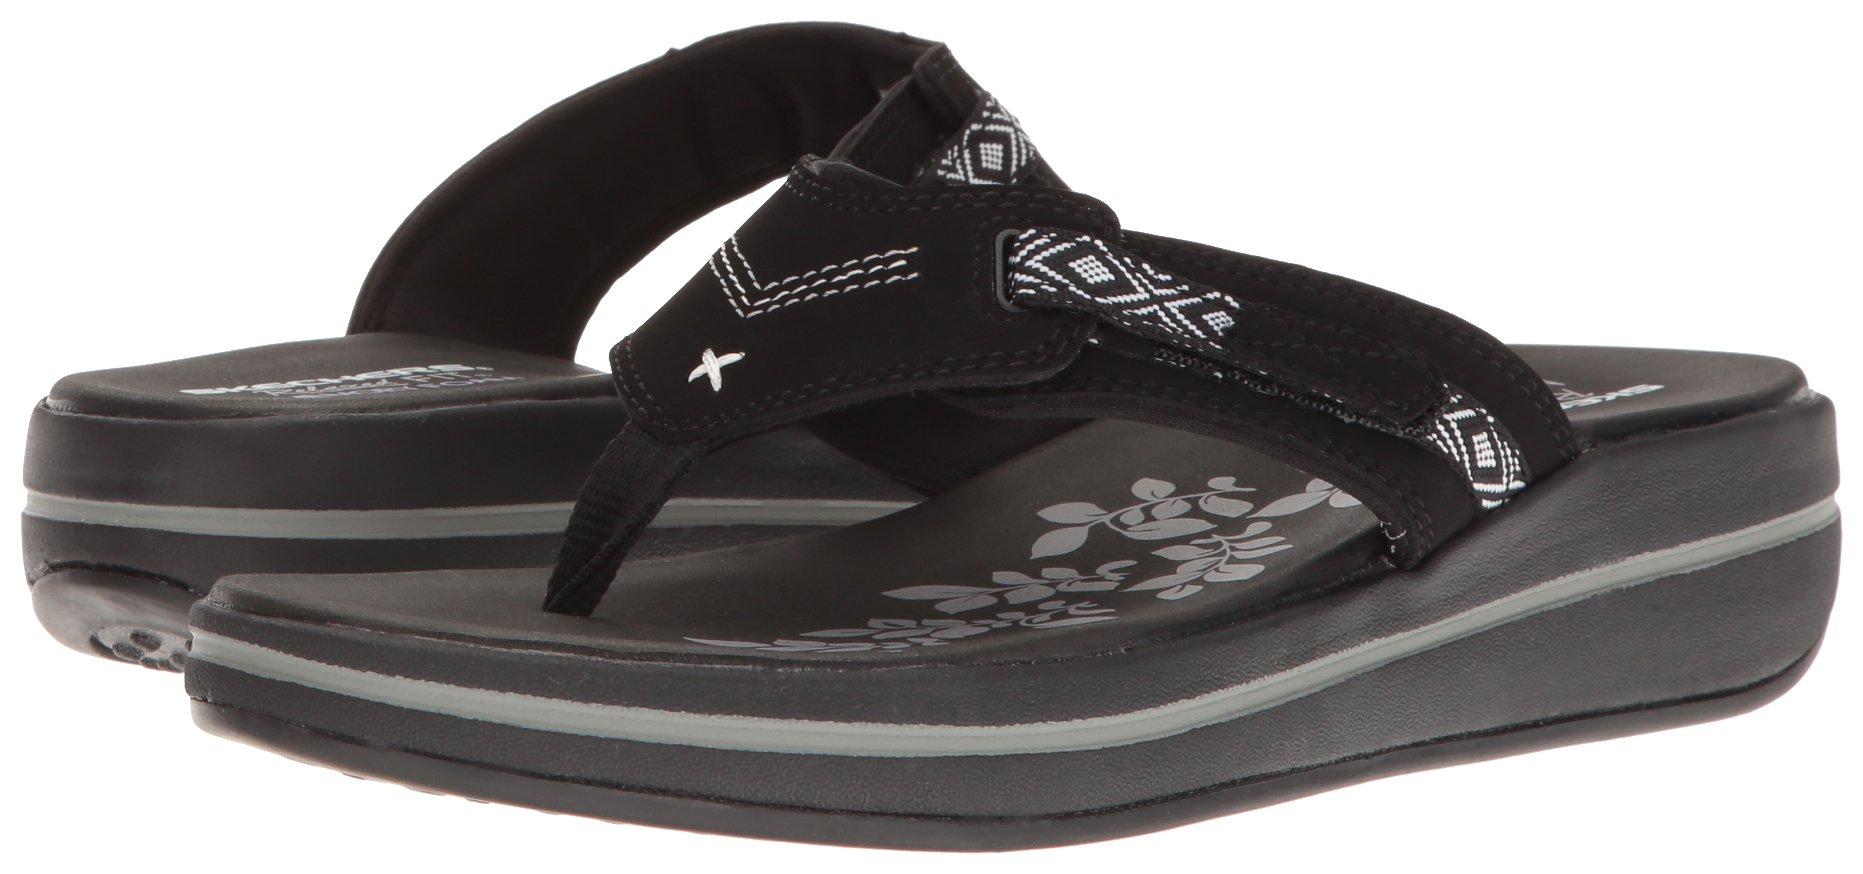 Skechers Modern Comfort Sandals Women's Upgrades Marina Bay Flip Flop Black/White, 8 M US by Skechers (Image #6)